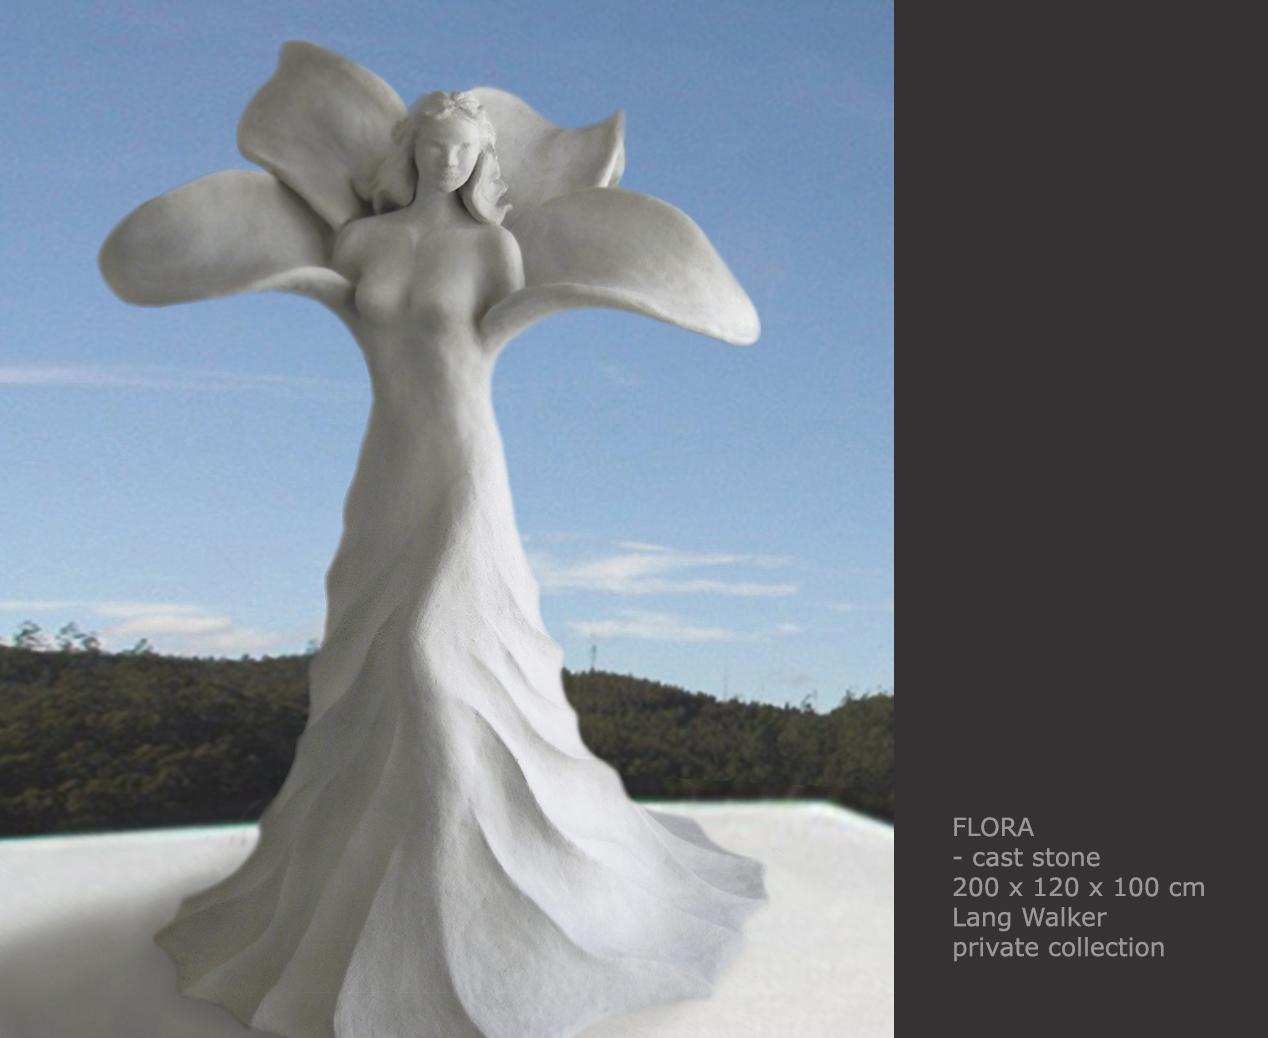 FLORA by M Marjanovich